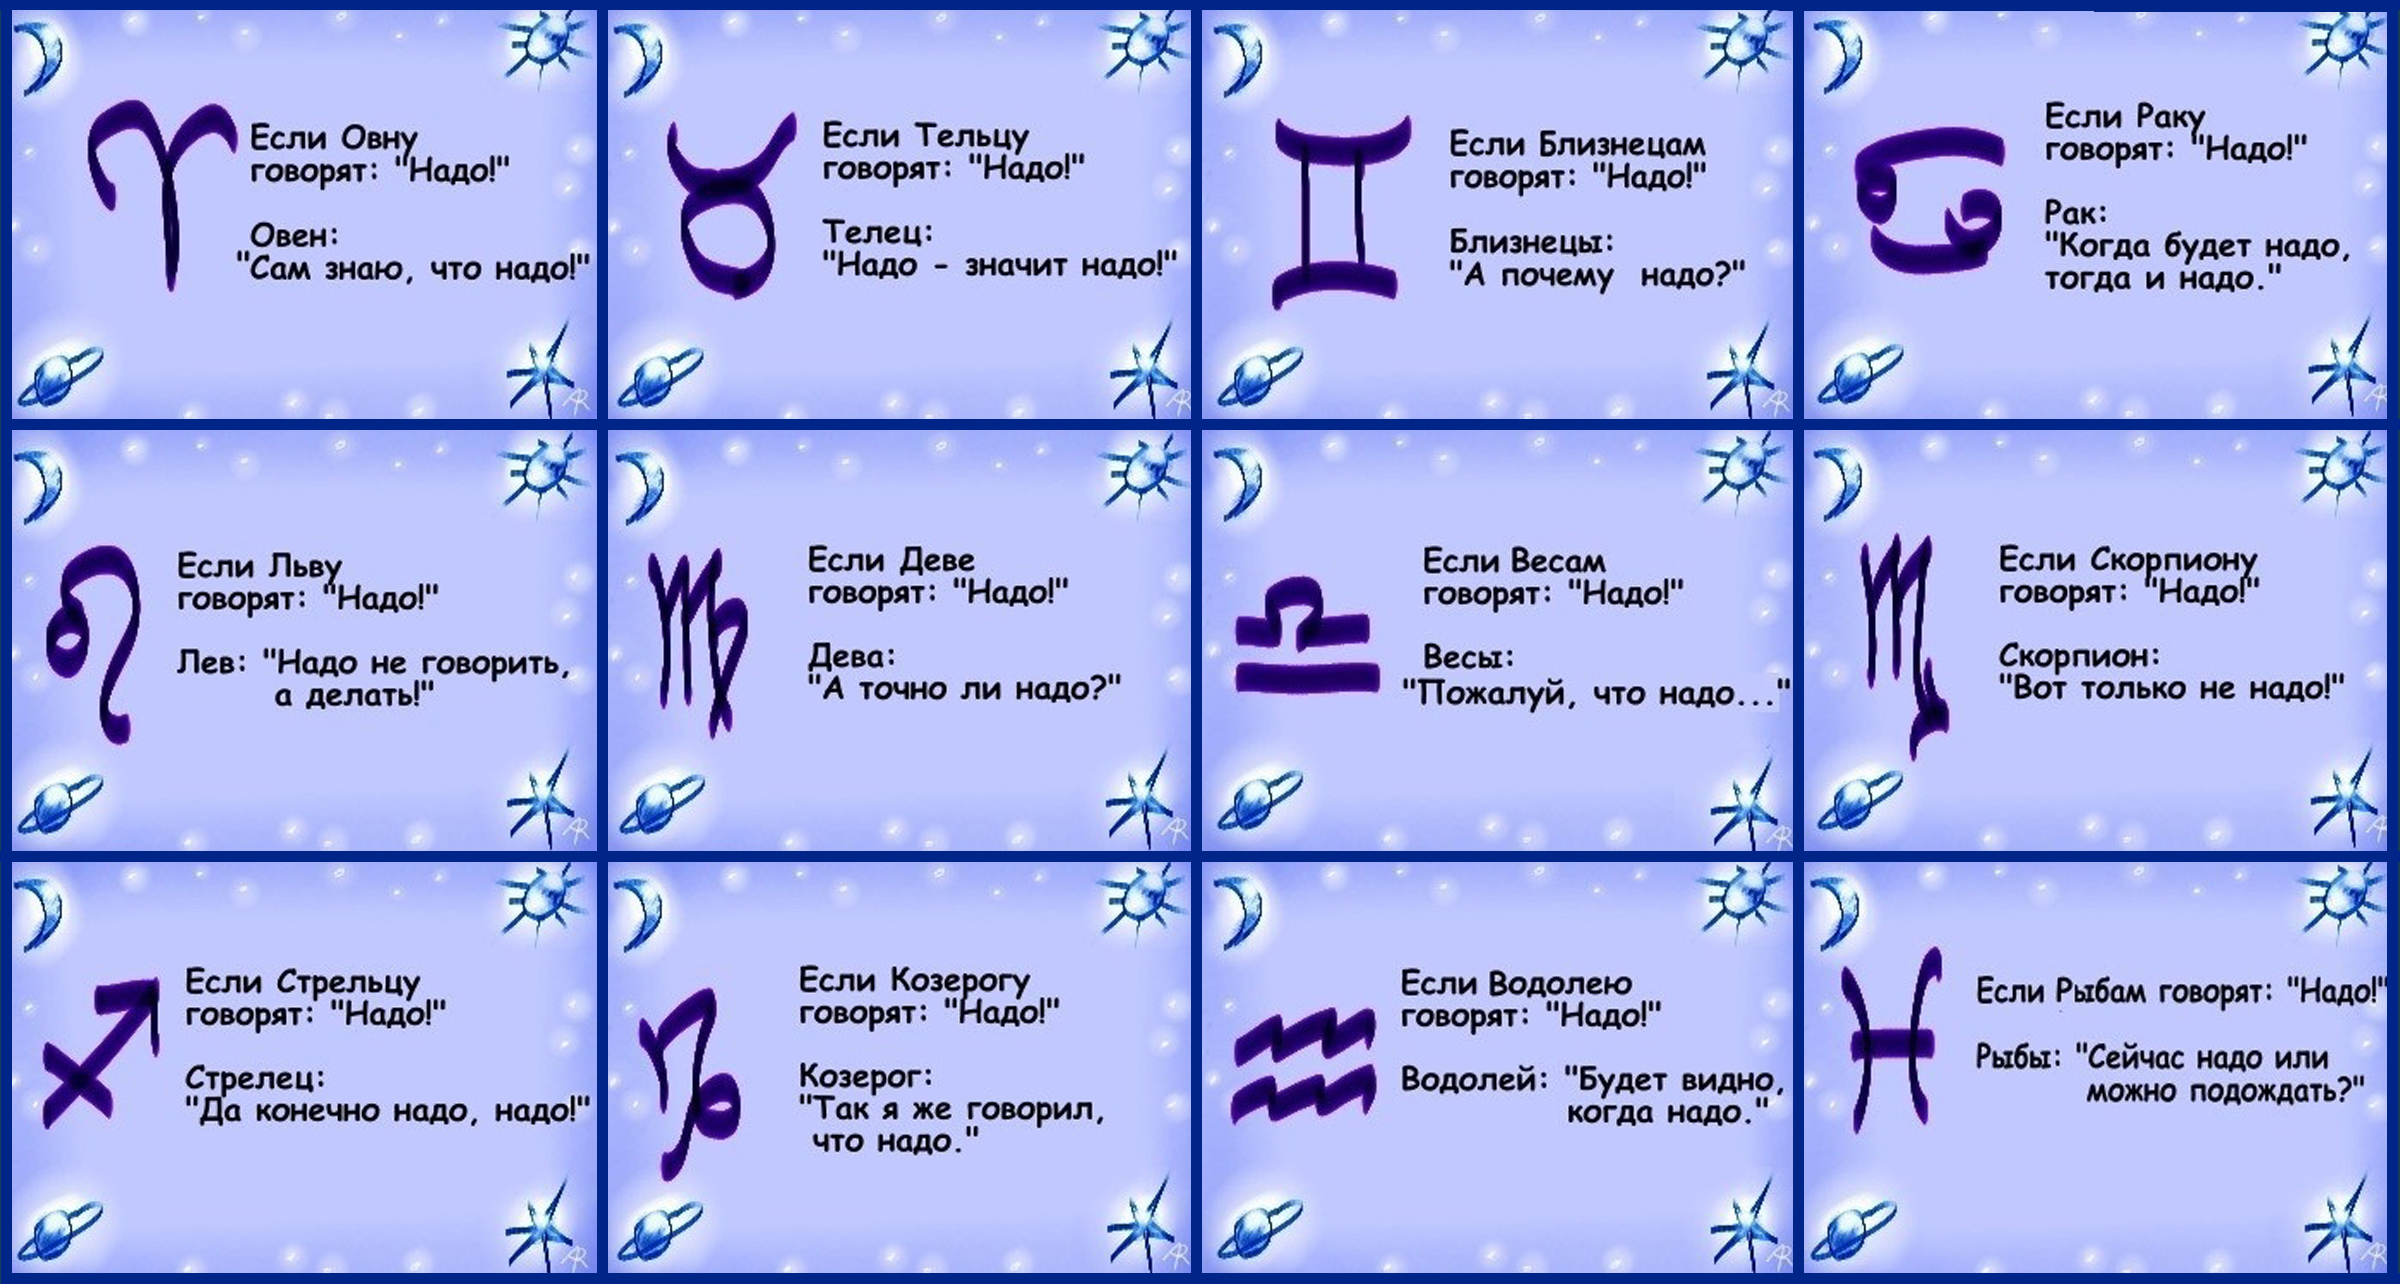 Как отвечают знаки Зодиака на надо